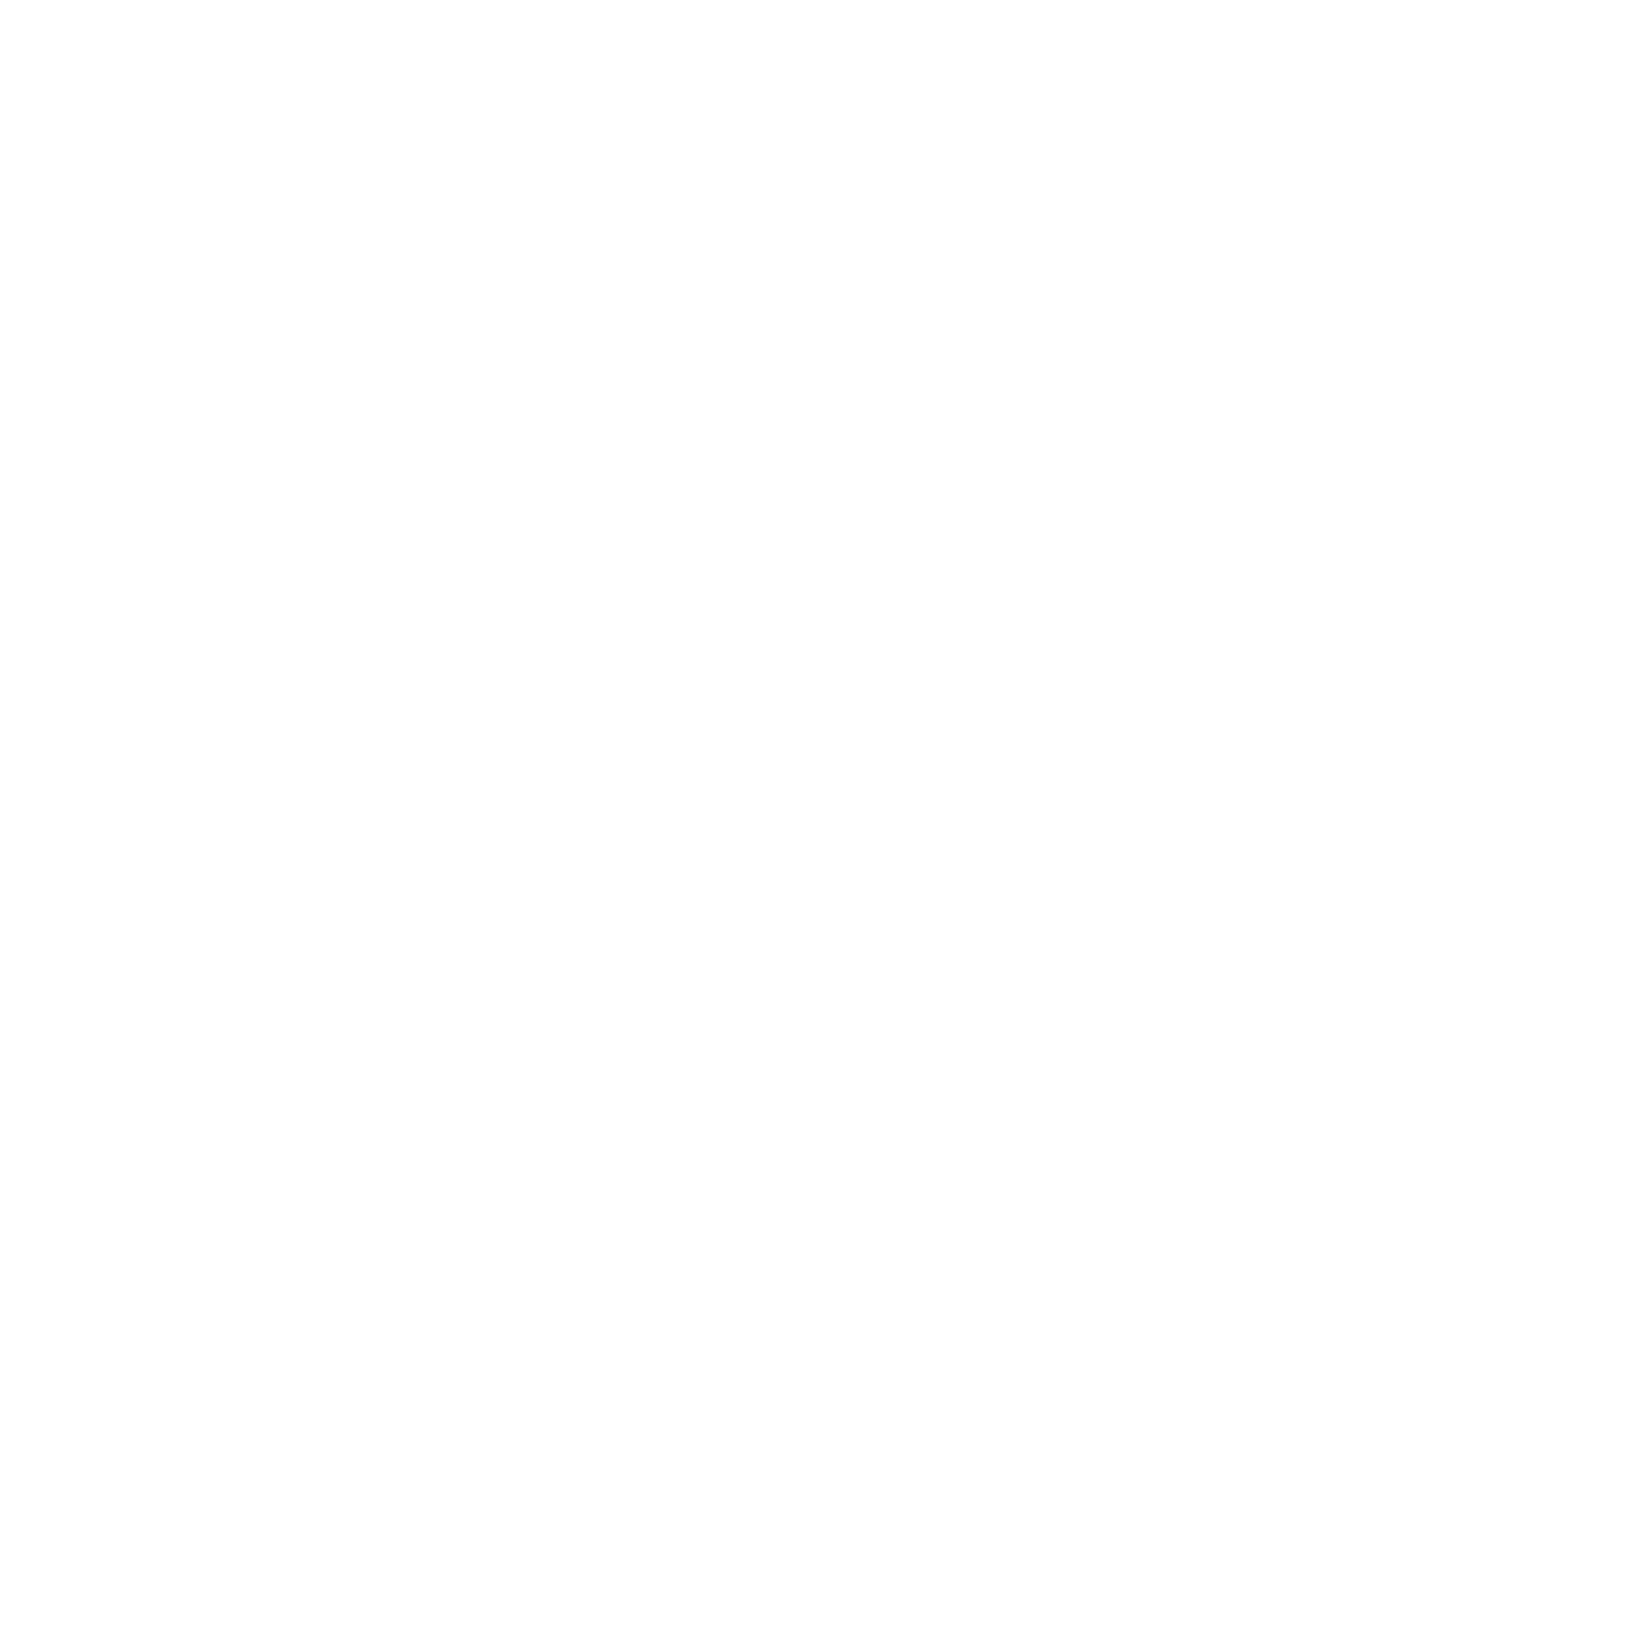 Southwestern Communities Coalition